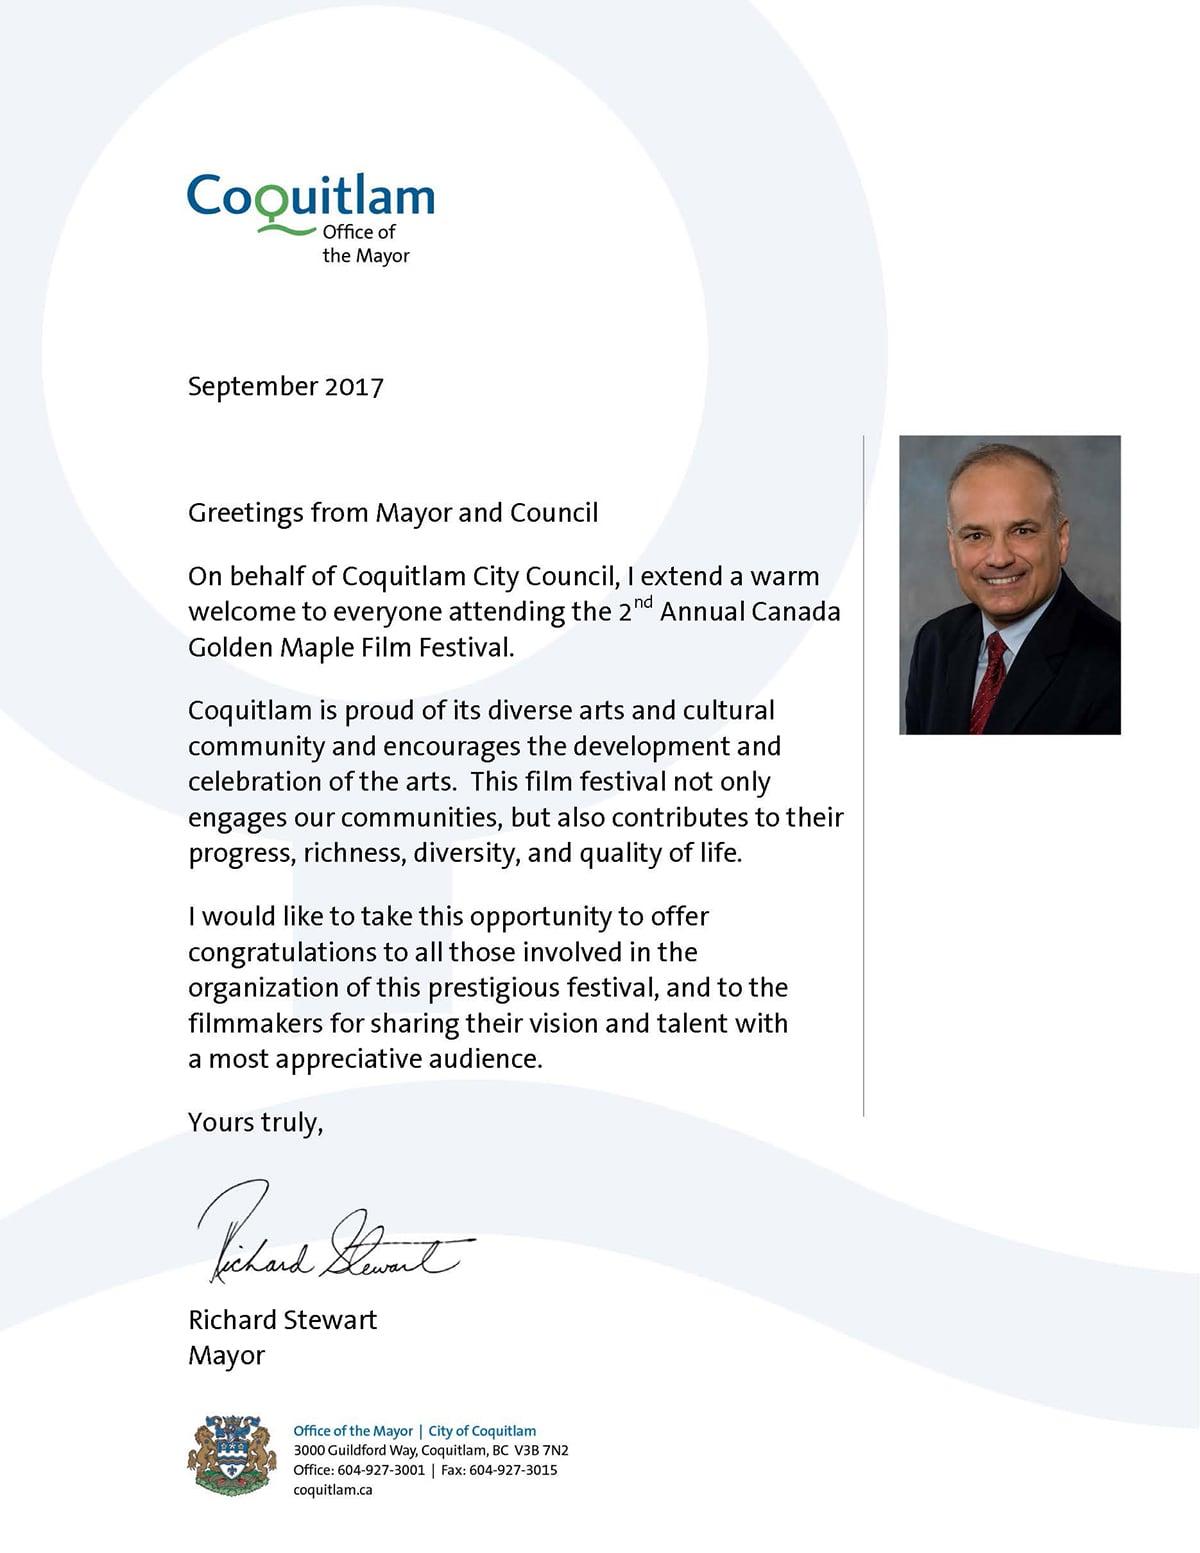 Congratulatory Letter from Richard Stewart, Mayor of Coquitlam